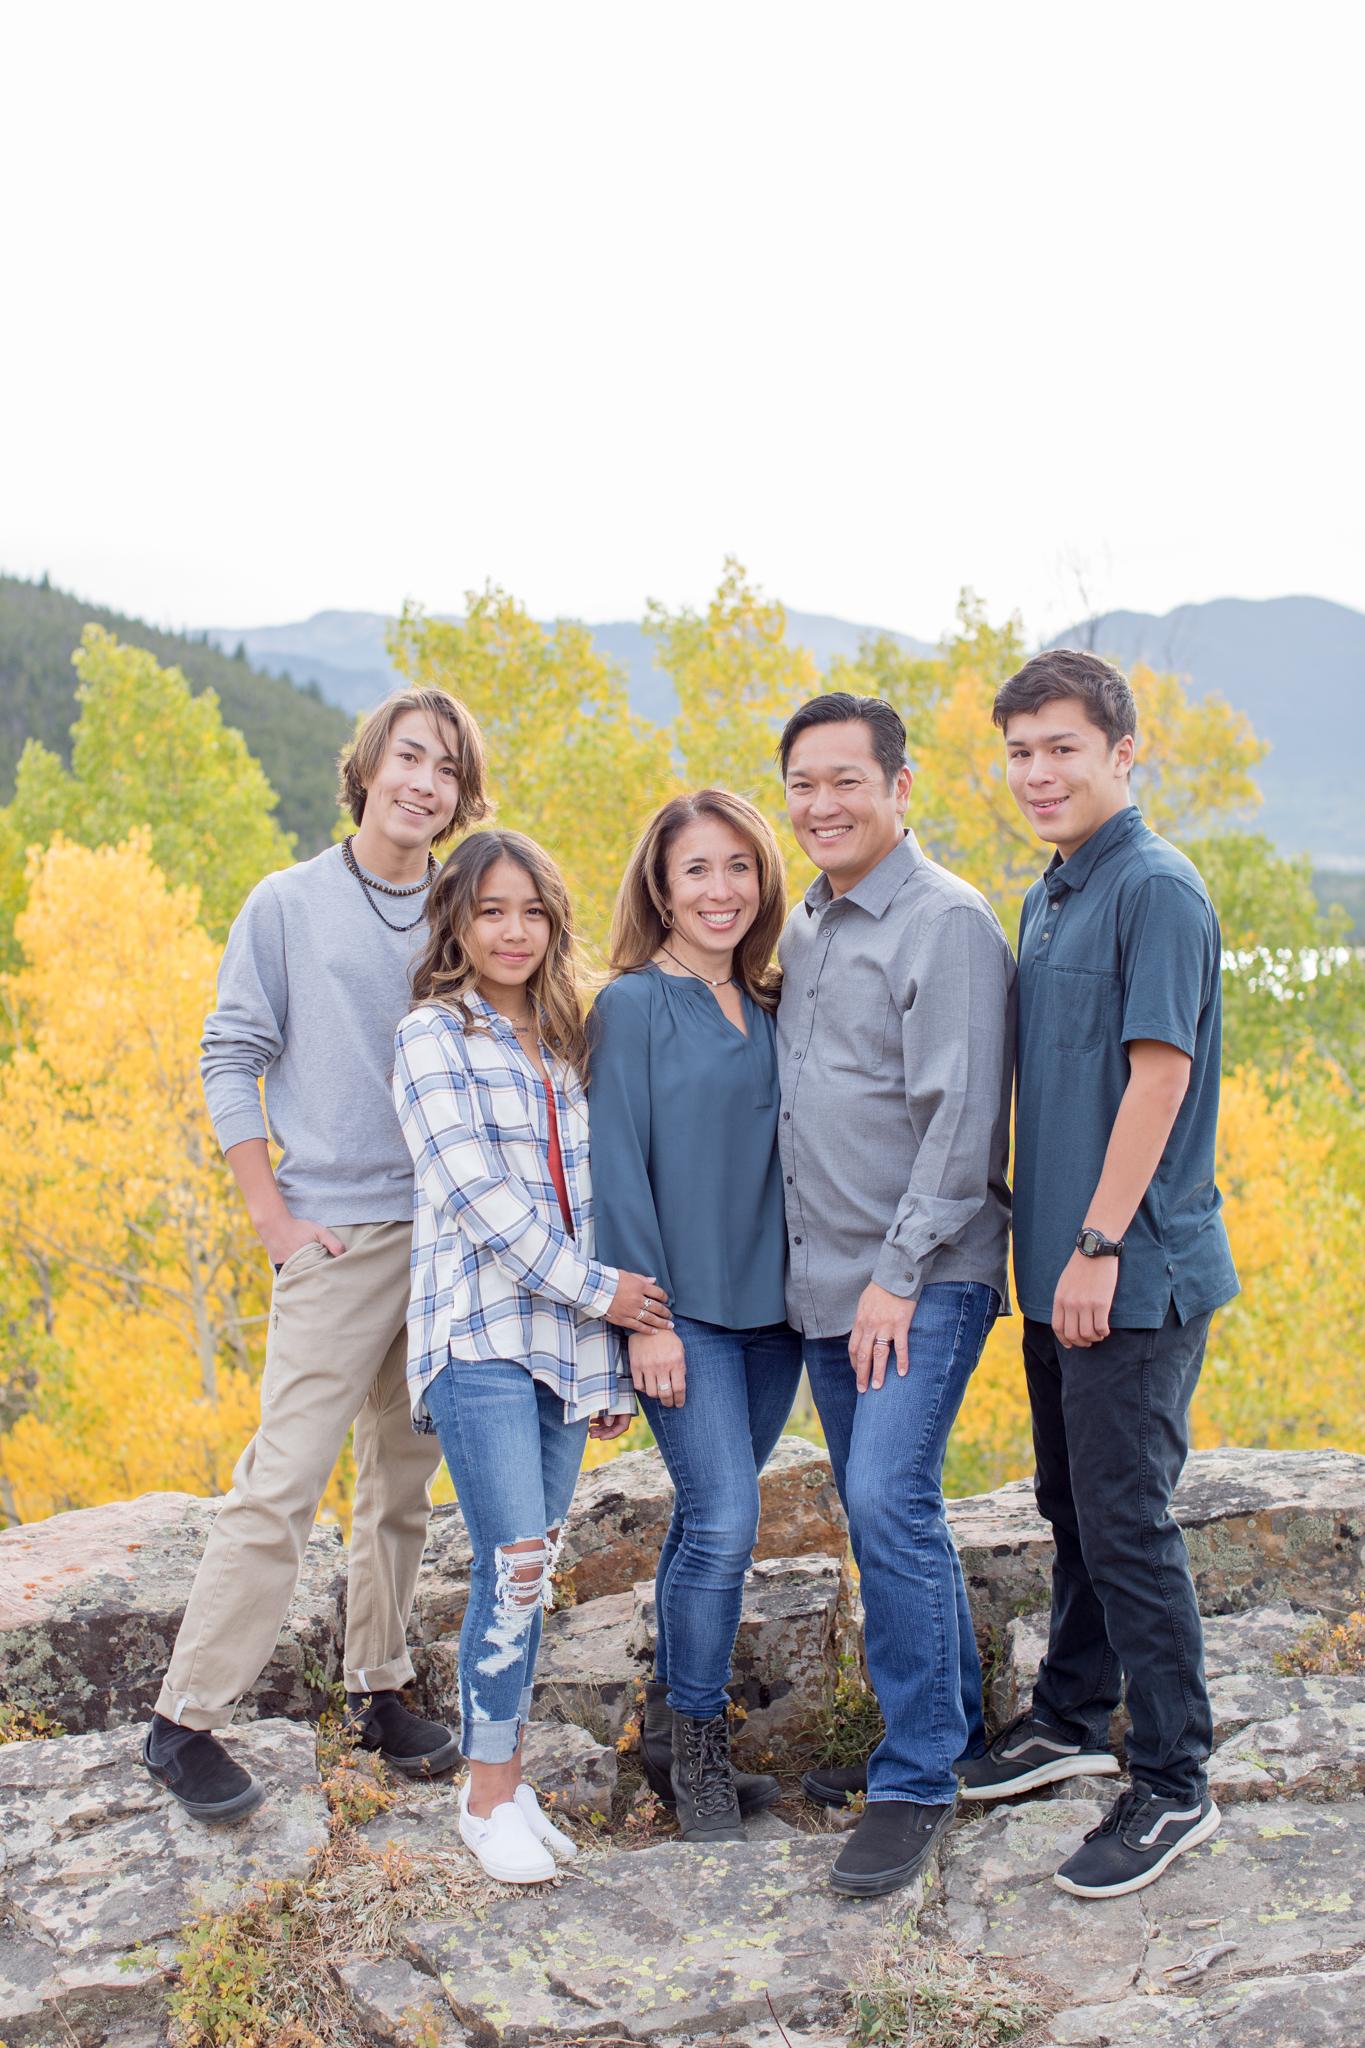 Dalrymple Family Breckenridge, Colorado